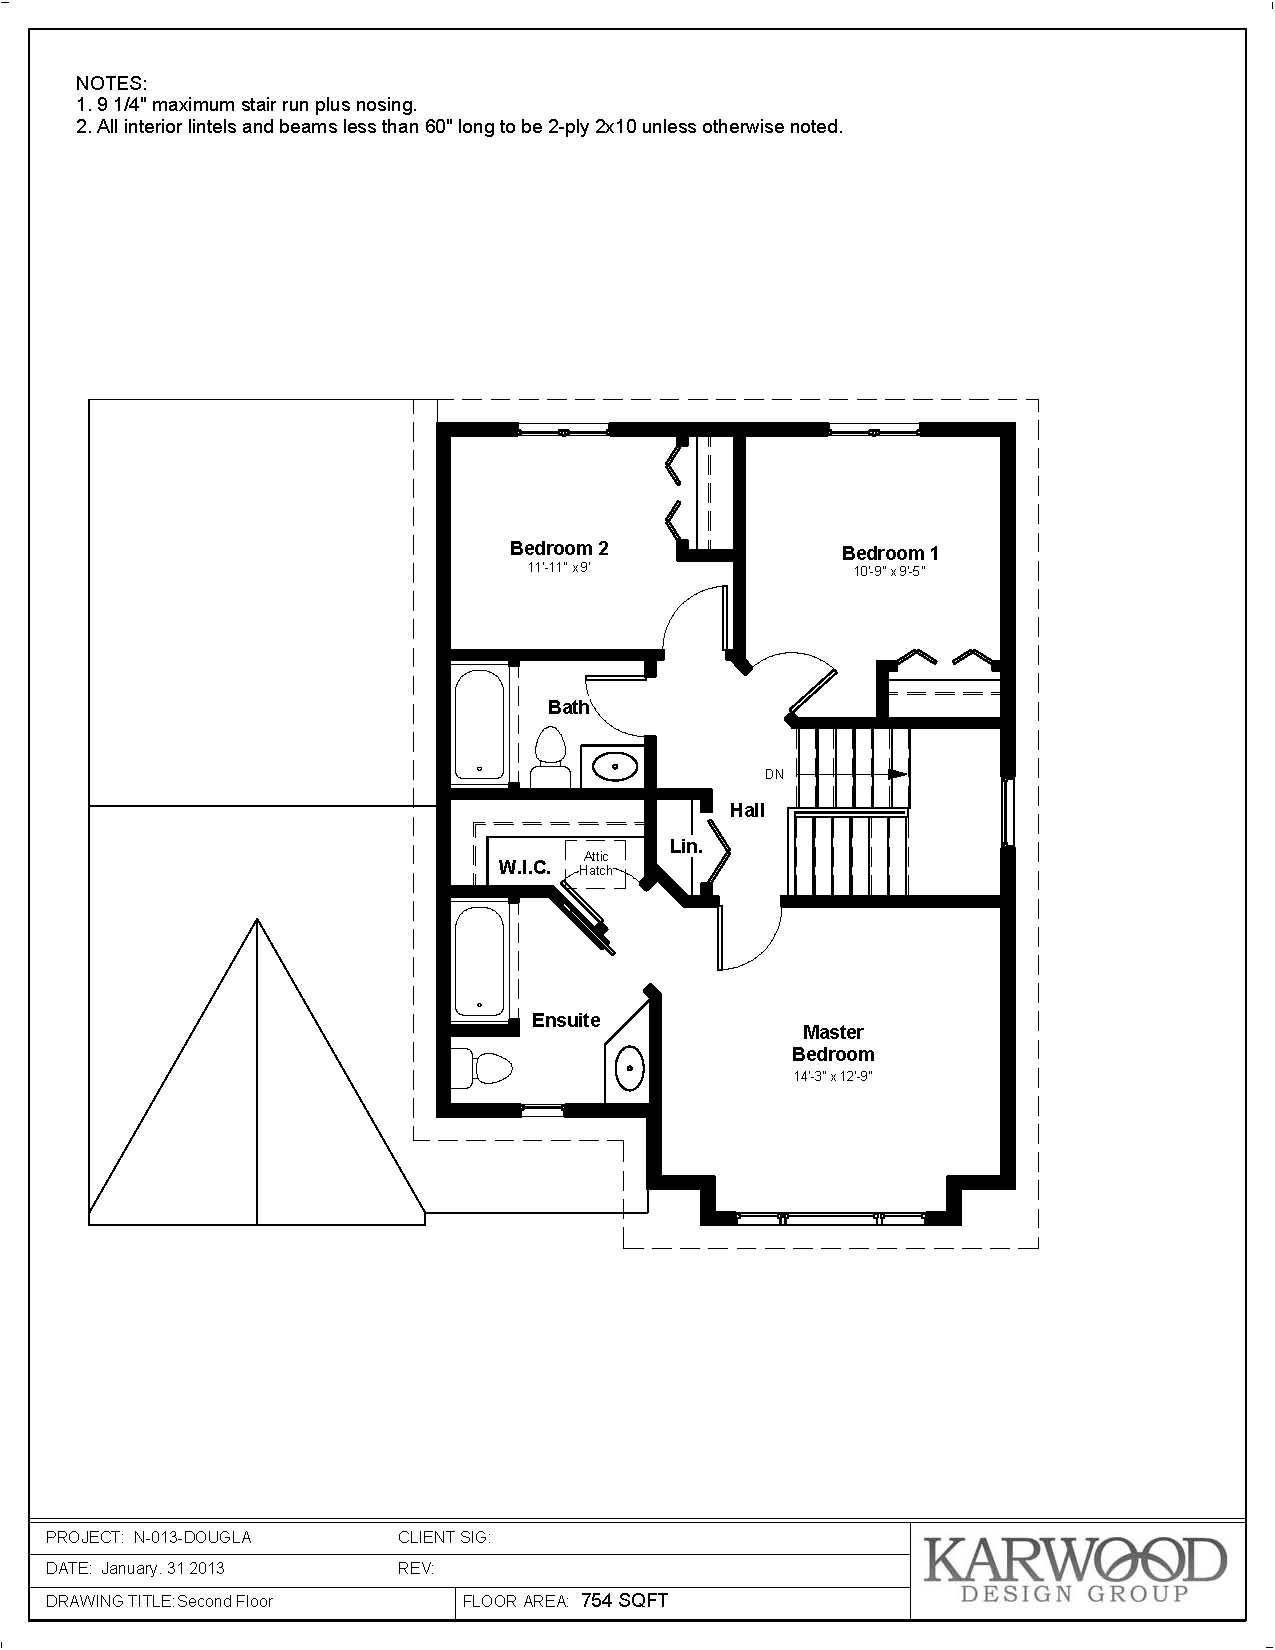 N-013-DOUGLA Listing - Second Floor.jpg